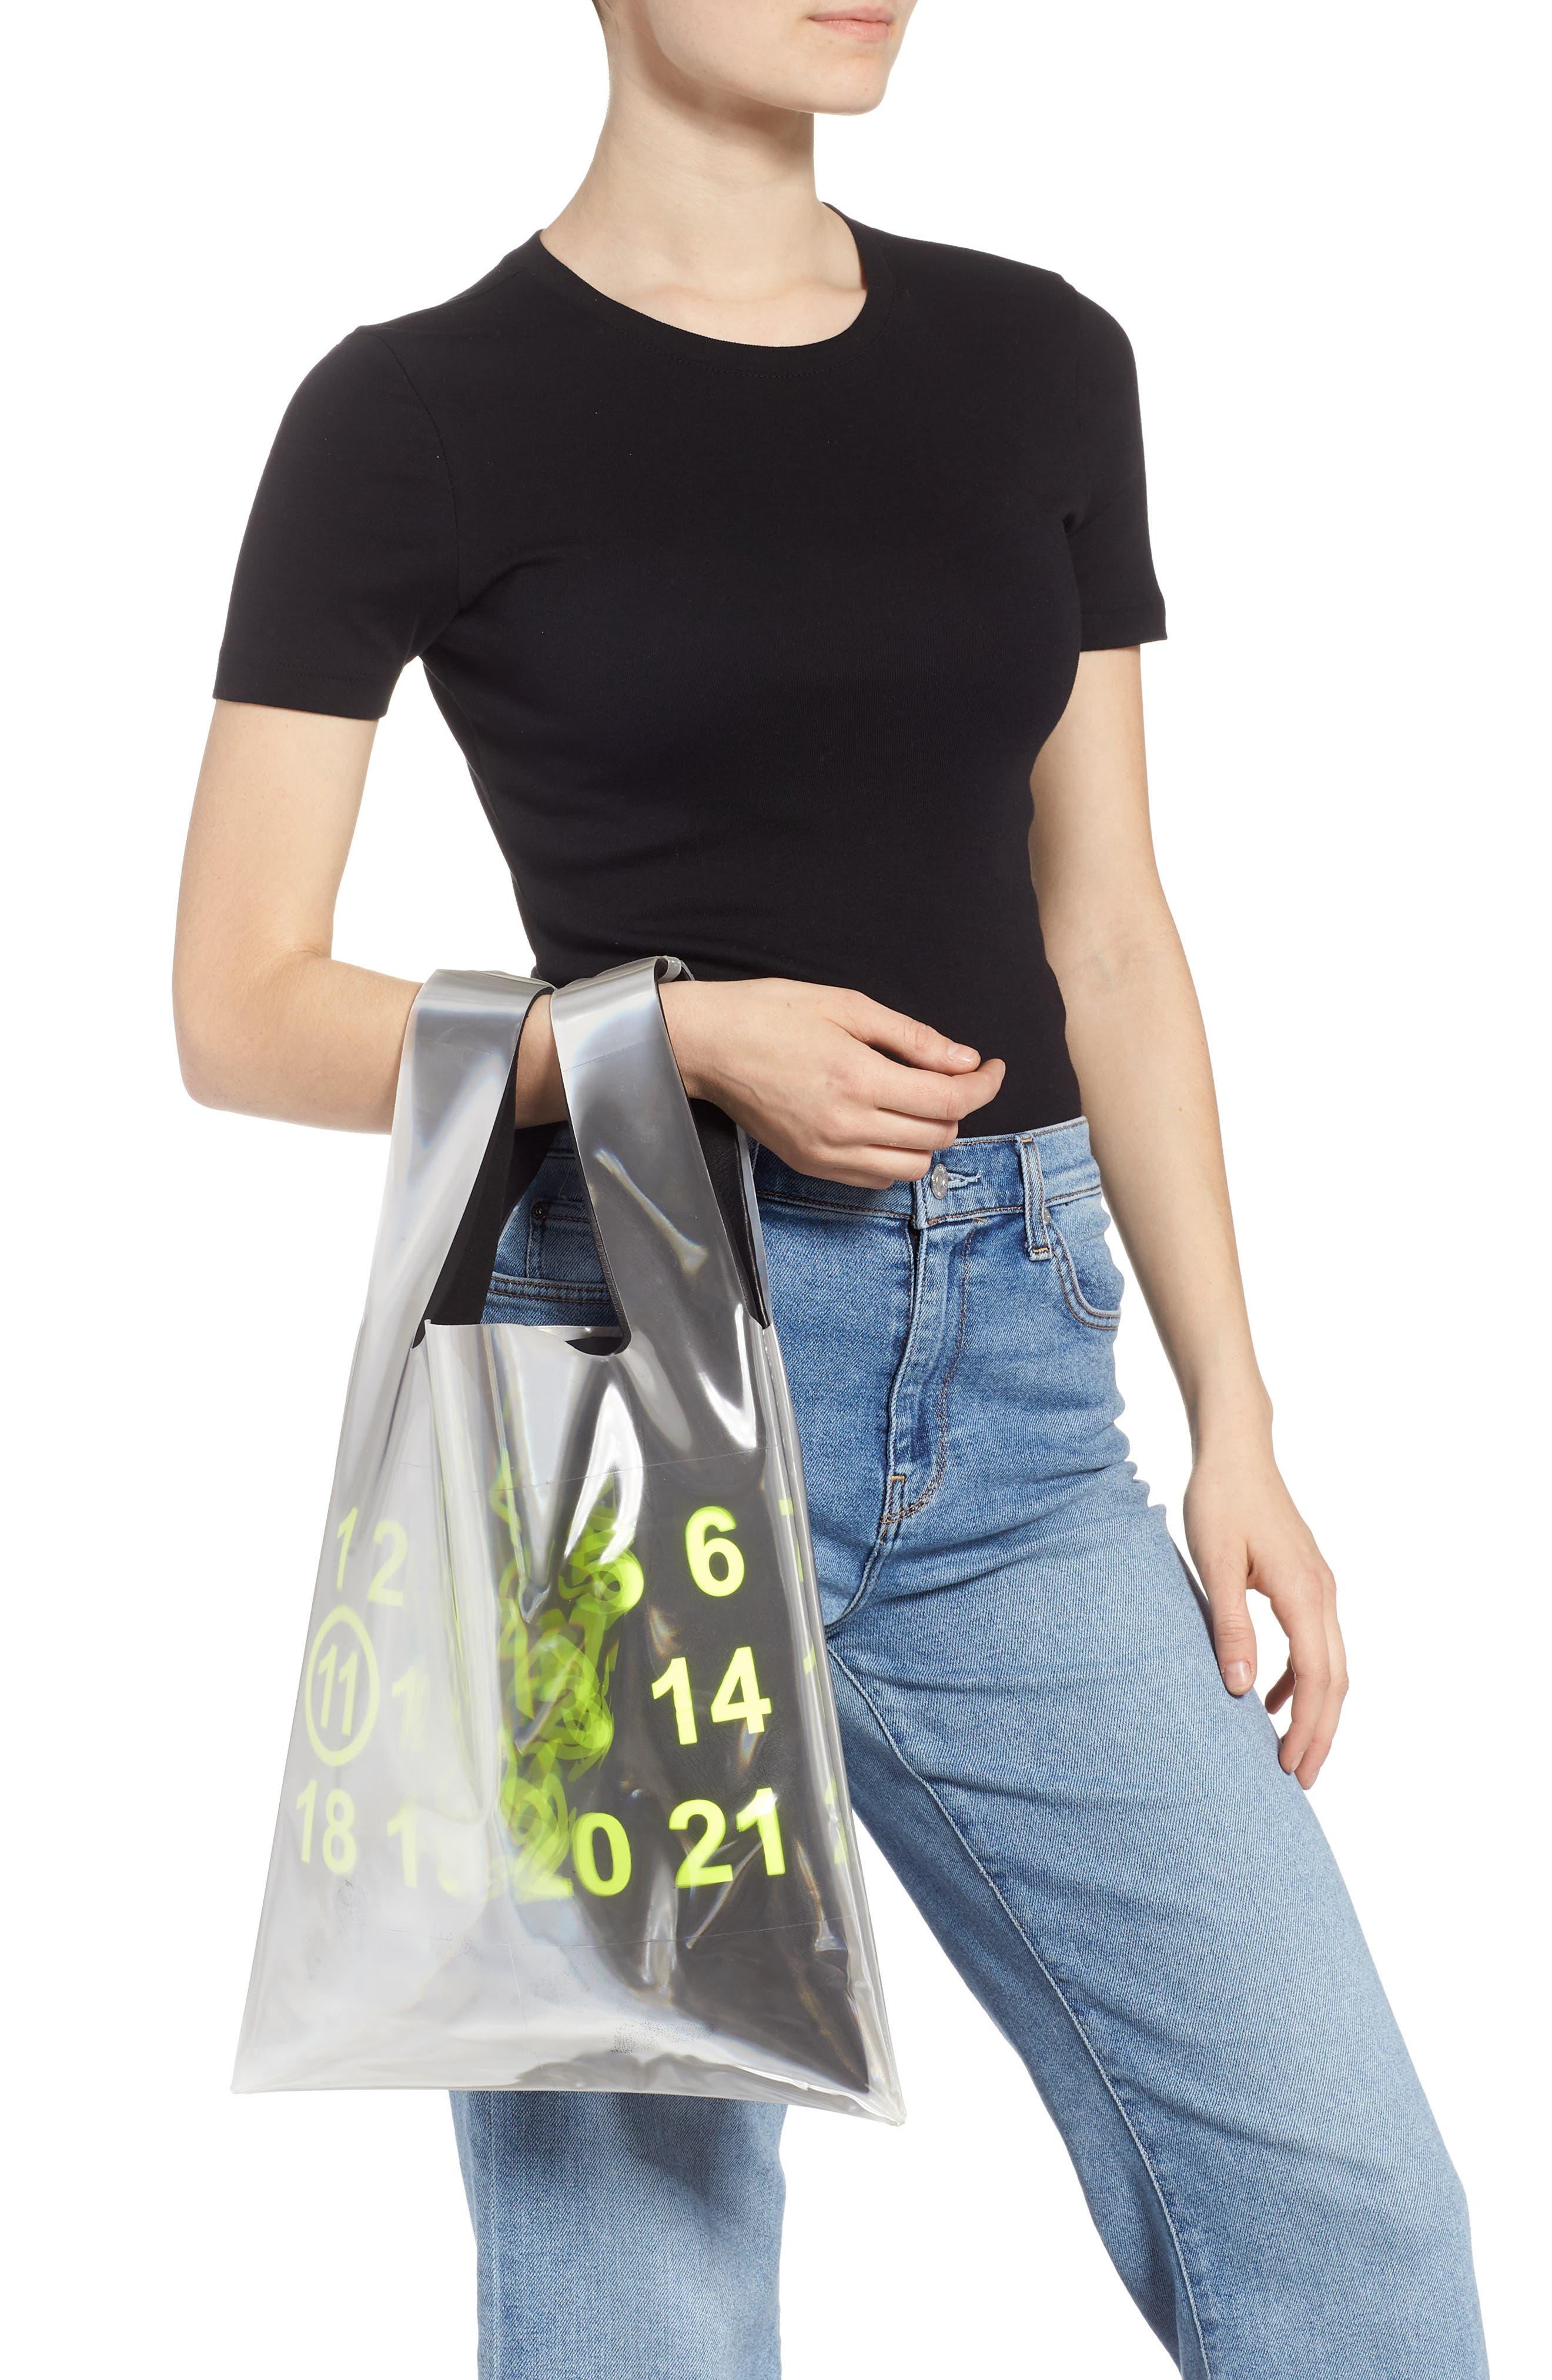 PVC & Leather Shopper Bag,                             Alternate thumbnail 2, color,                             BLACK/ YELLOW FLUO